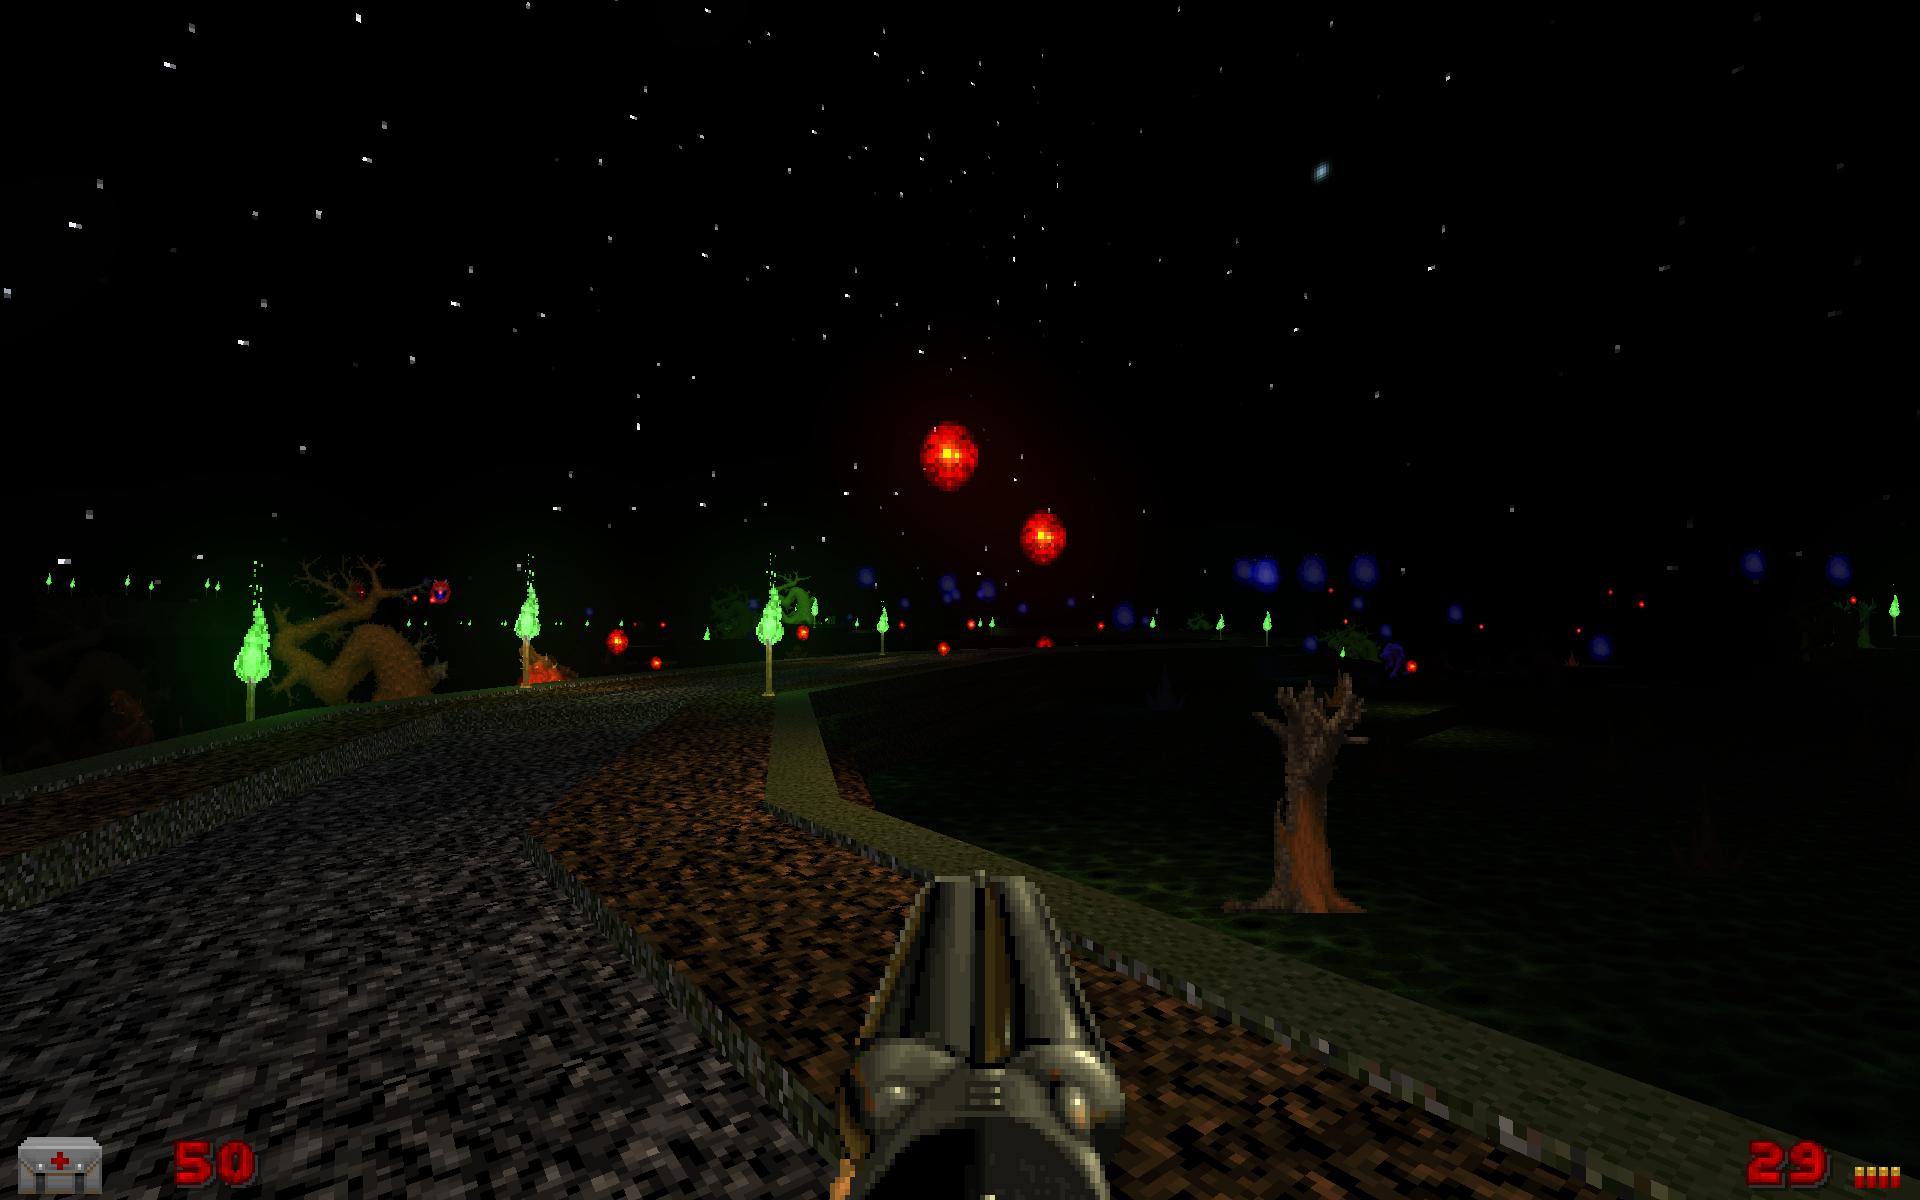 Screenshot_Doom_20210525_221714.png.ed79e8568e5dc92878c57134b90a4629.png